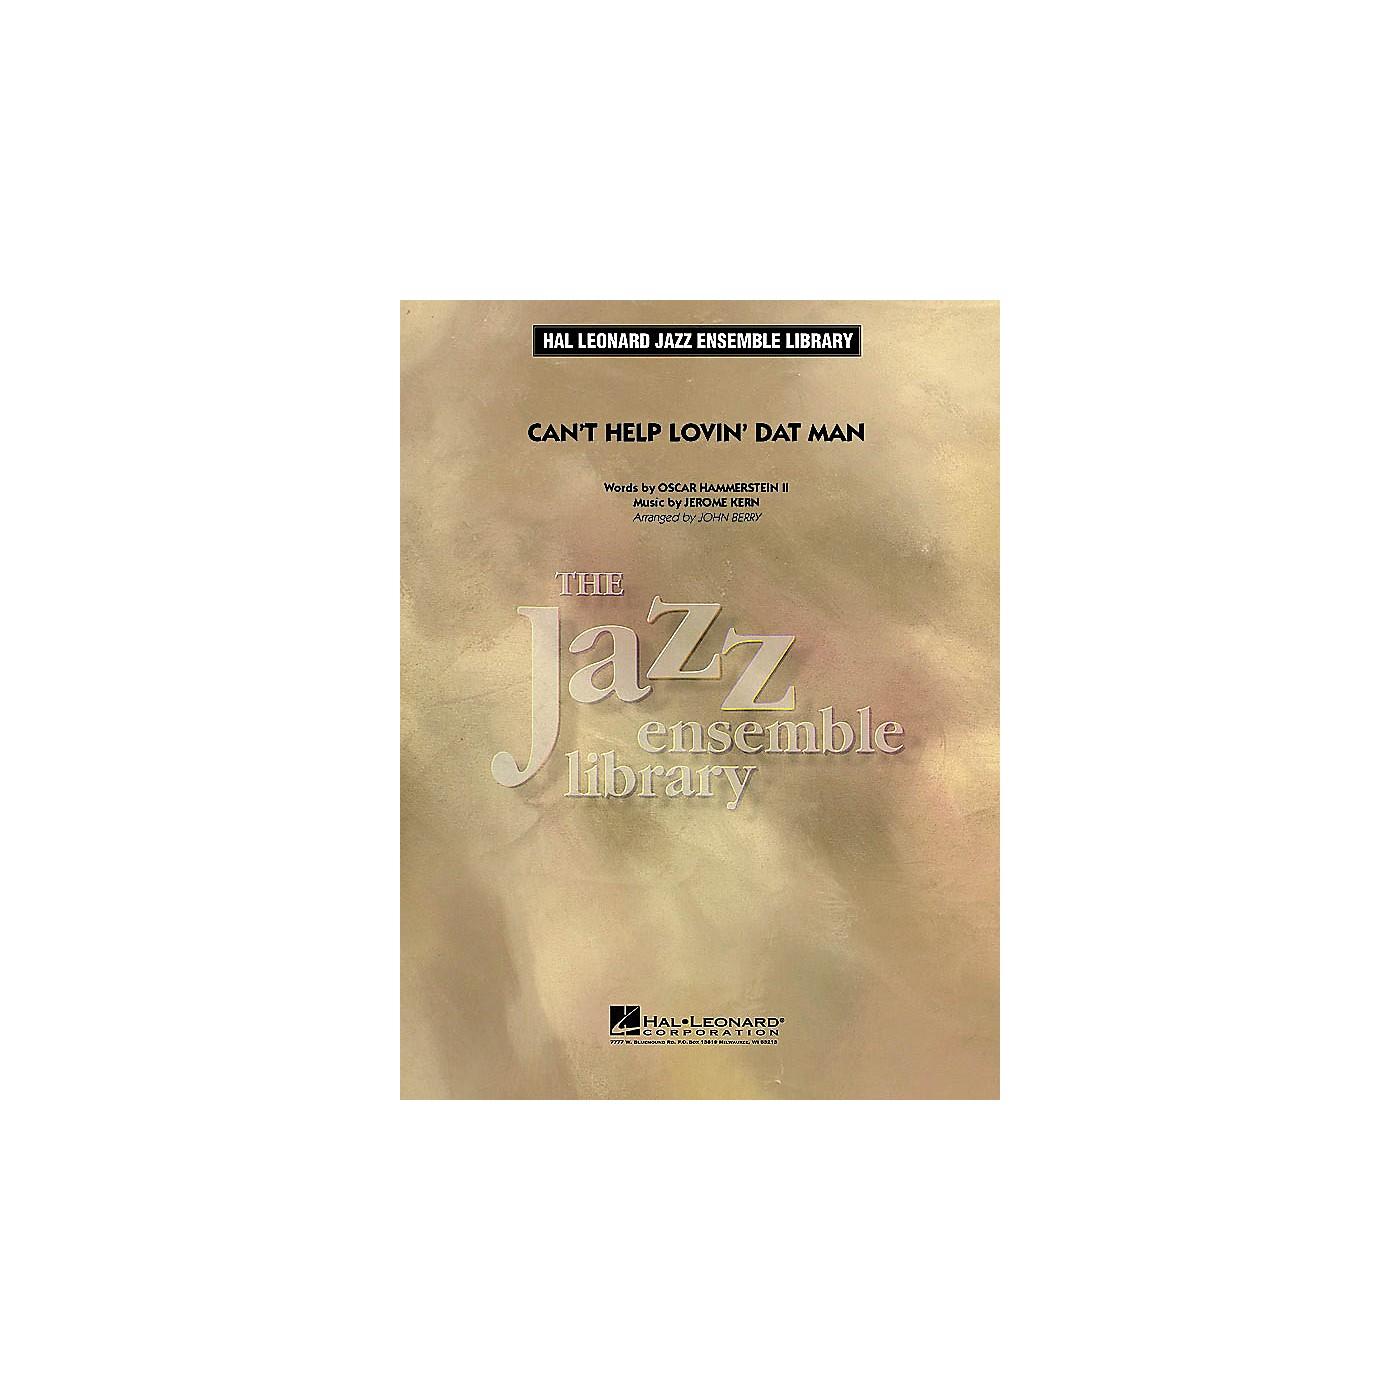 Hal Leonard Can't Help Lovin' Dat Man Jazz Band Level 4 Arranged by John Berry thumbnail